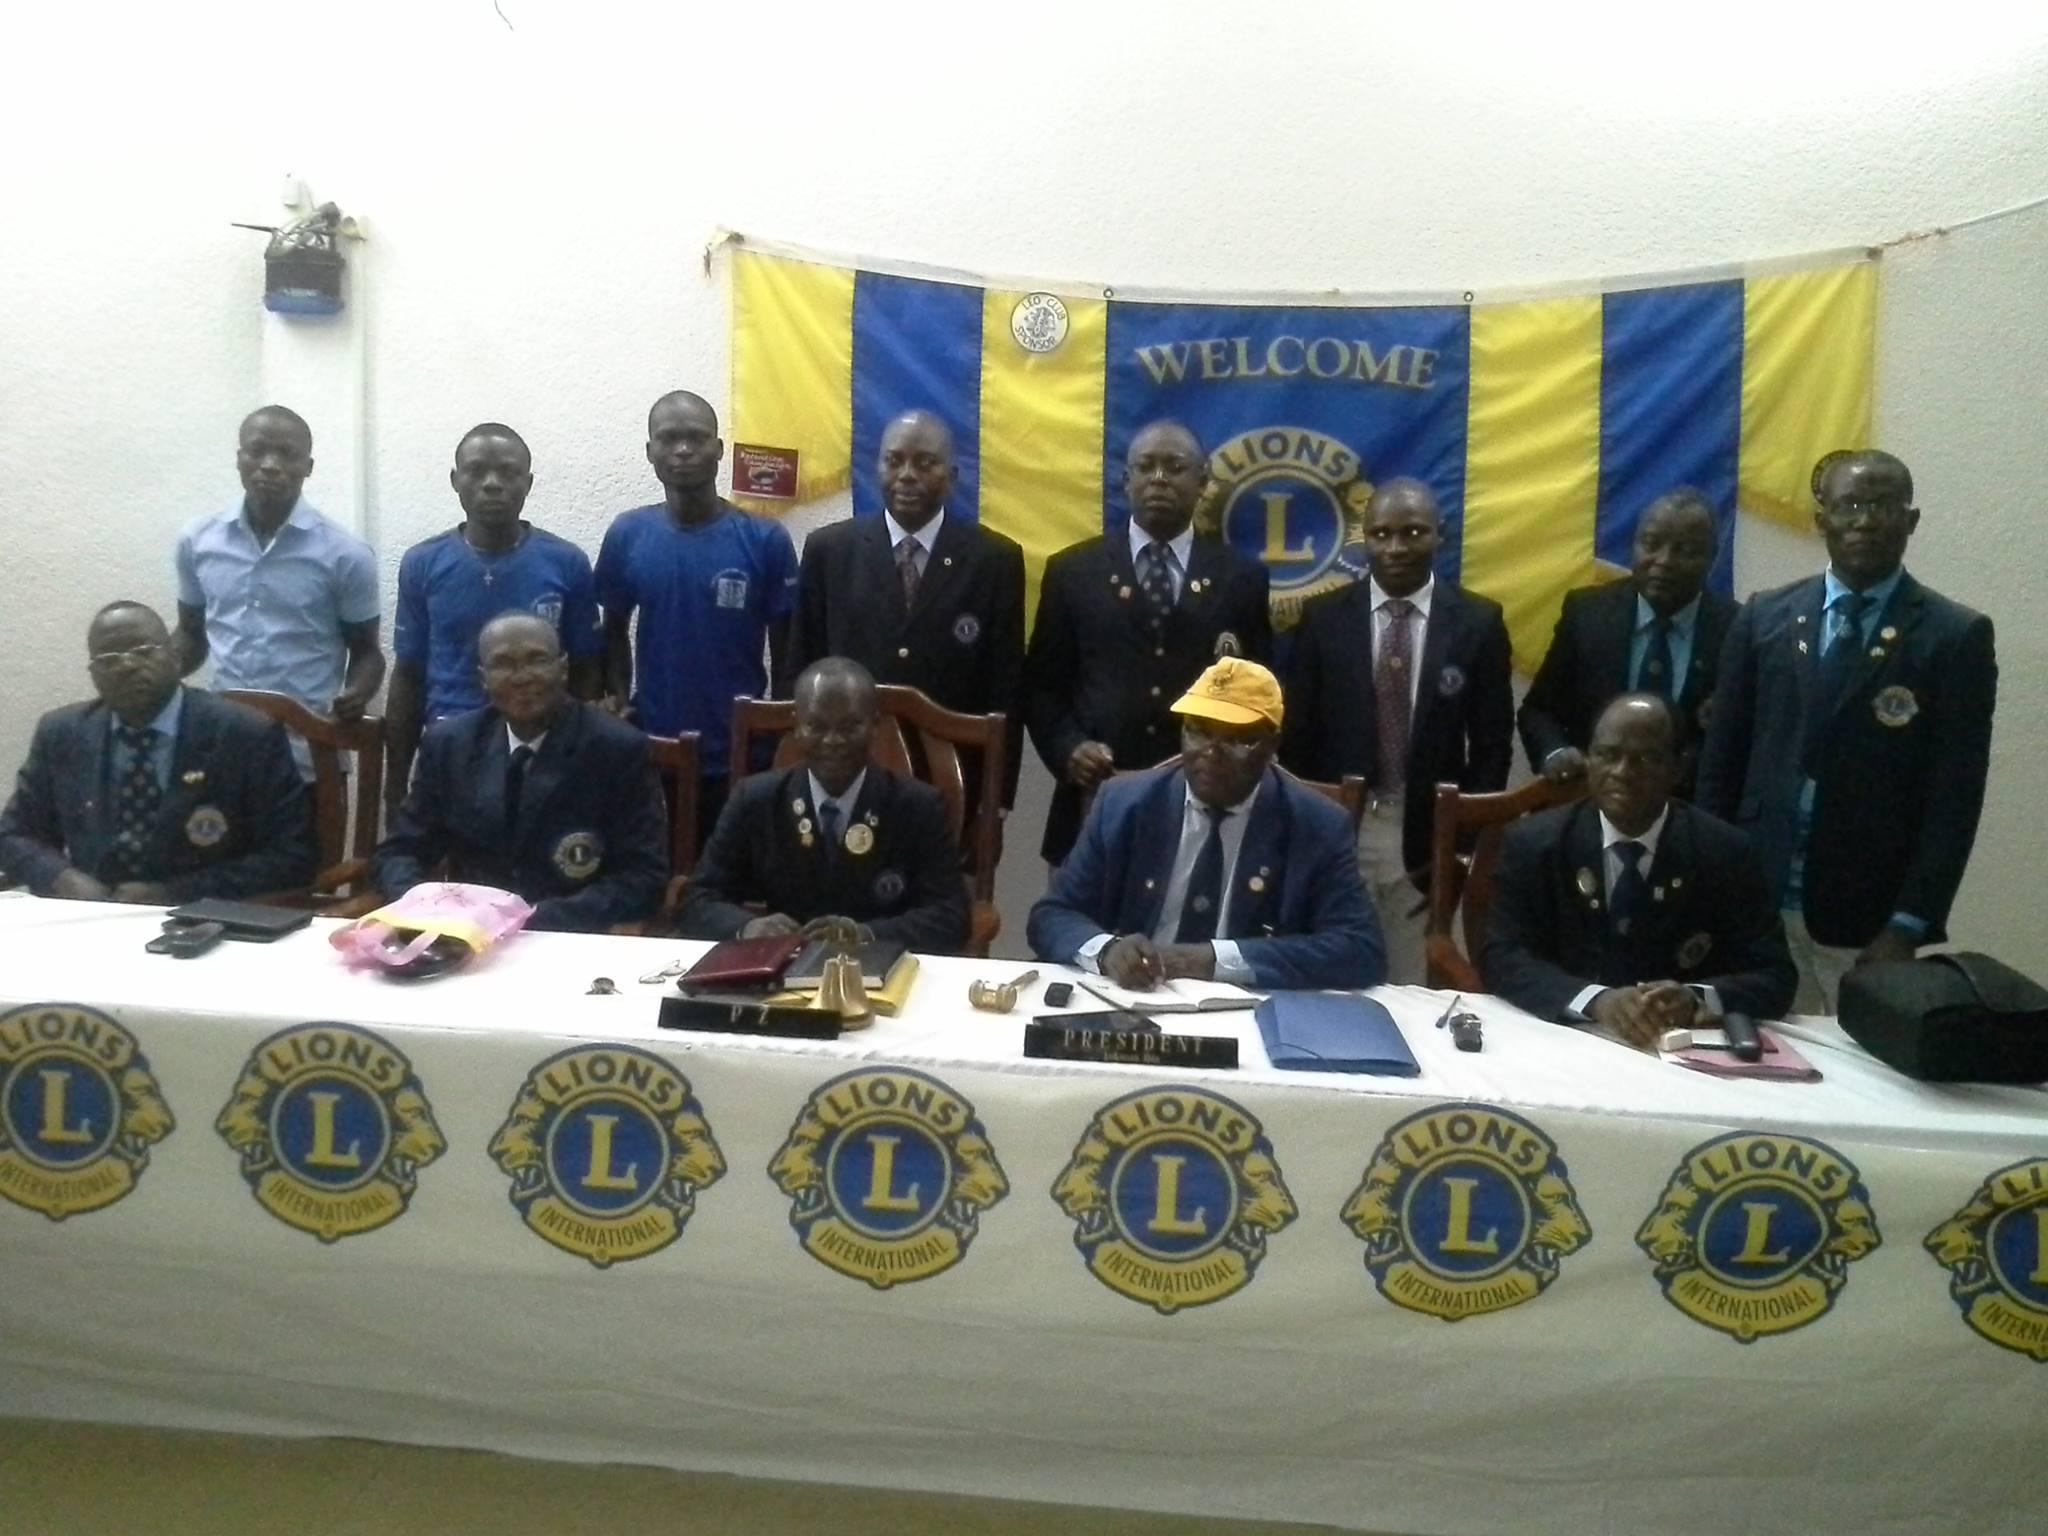 LIONS CLUB LOKOSSA IBIS